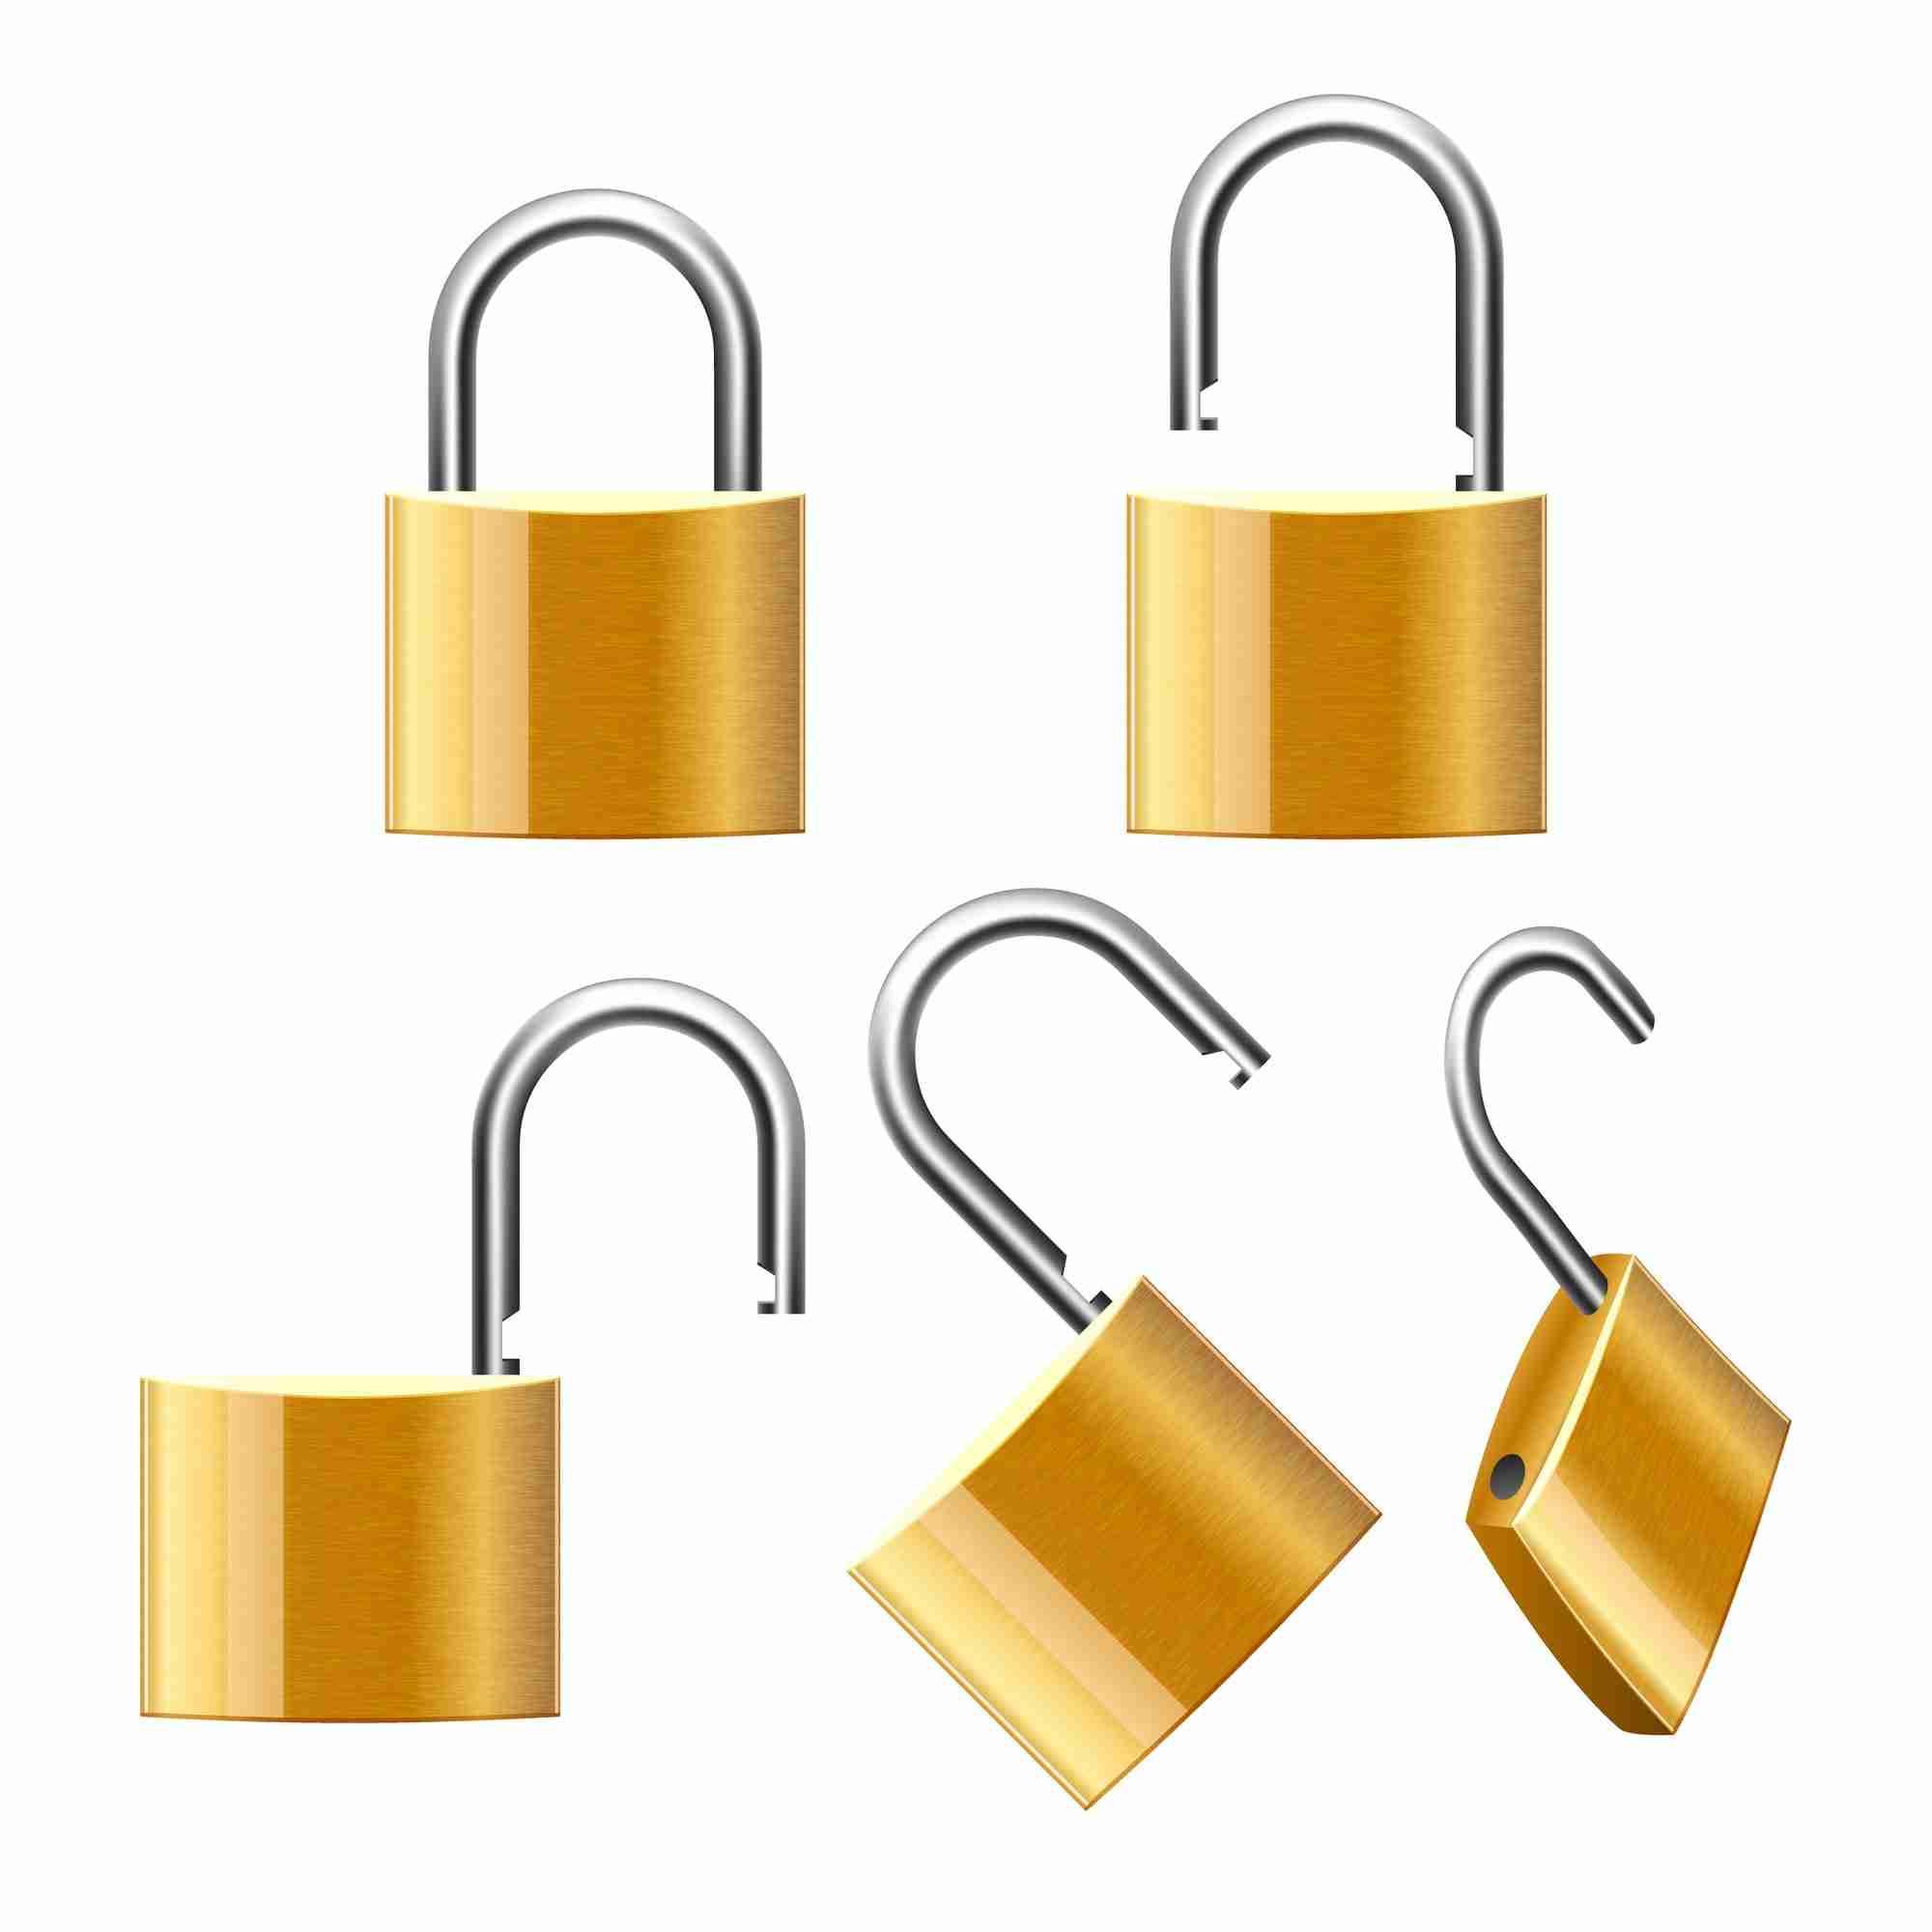 Image of a lock gradually opening